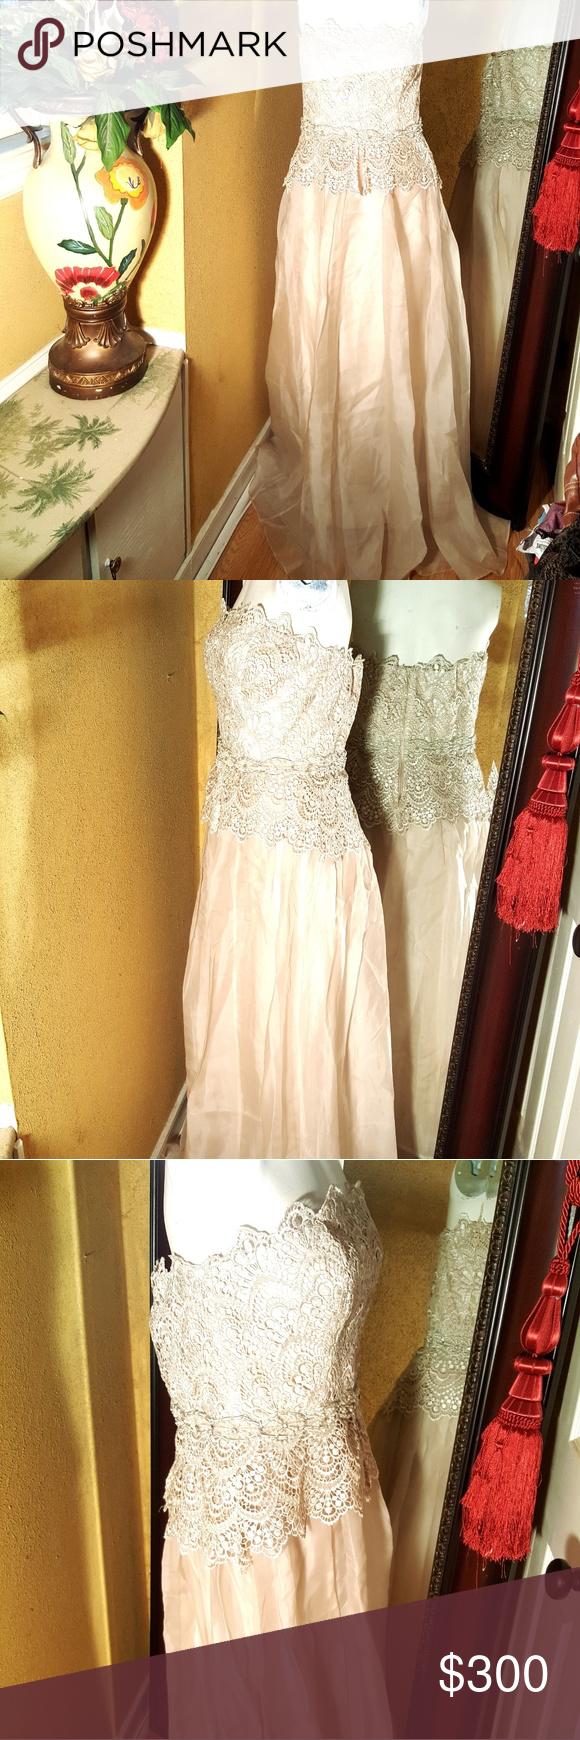 Lace wedding dress under 300  Badgley Mischka lace strapless dress bridal gown  My Posh Picks